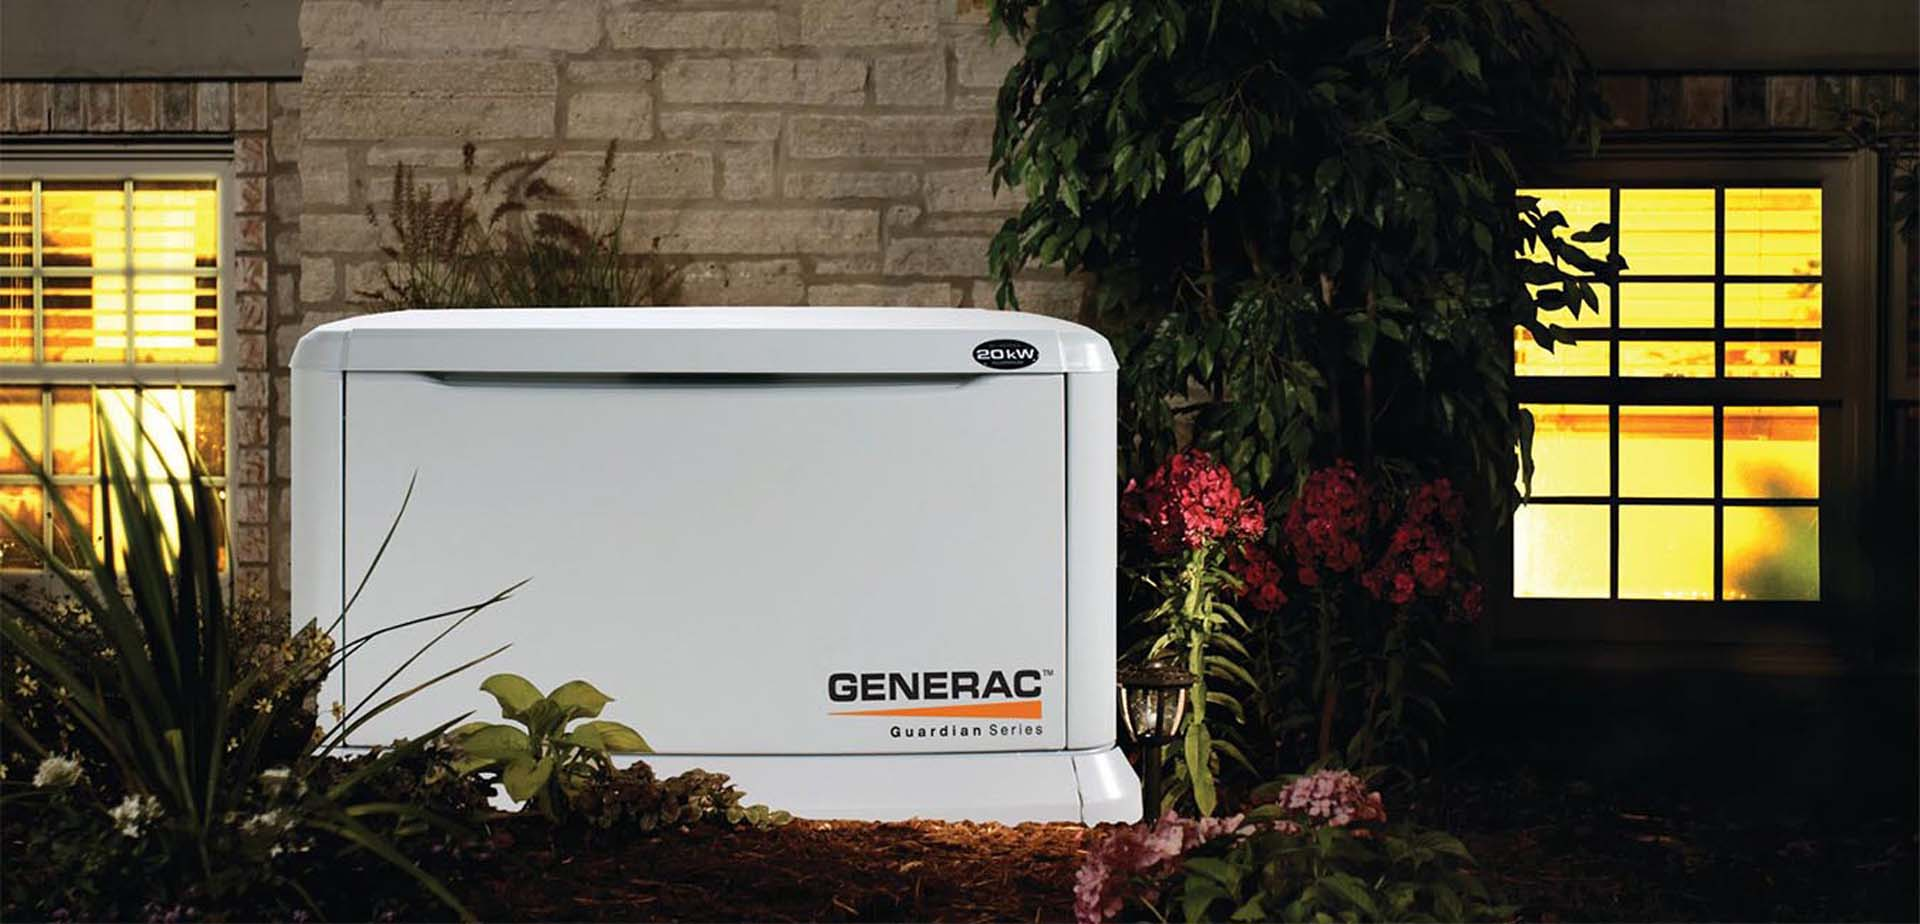 Generator Installation, Repair Services & Sale